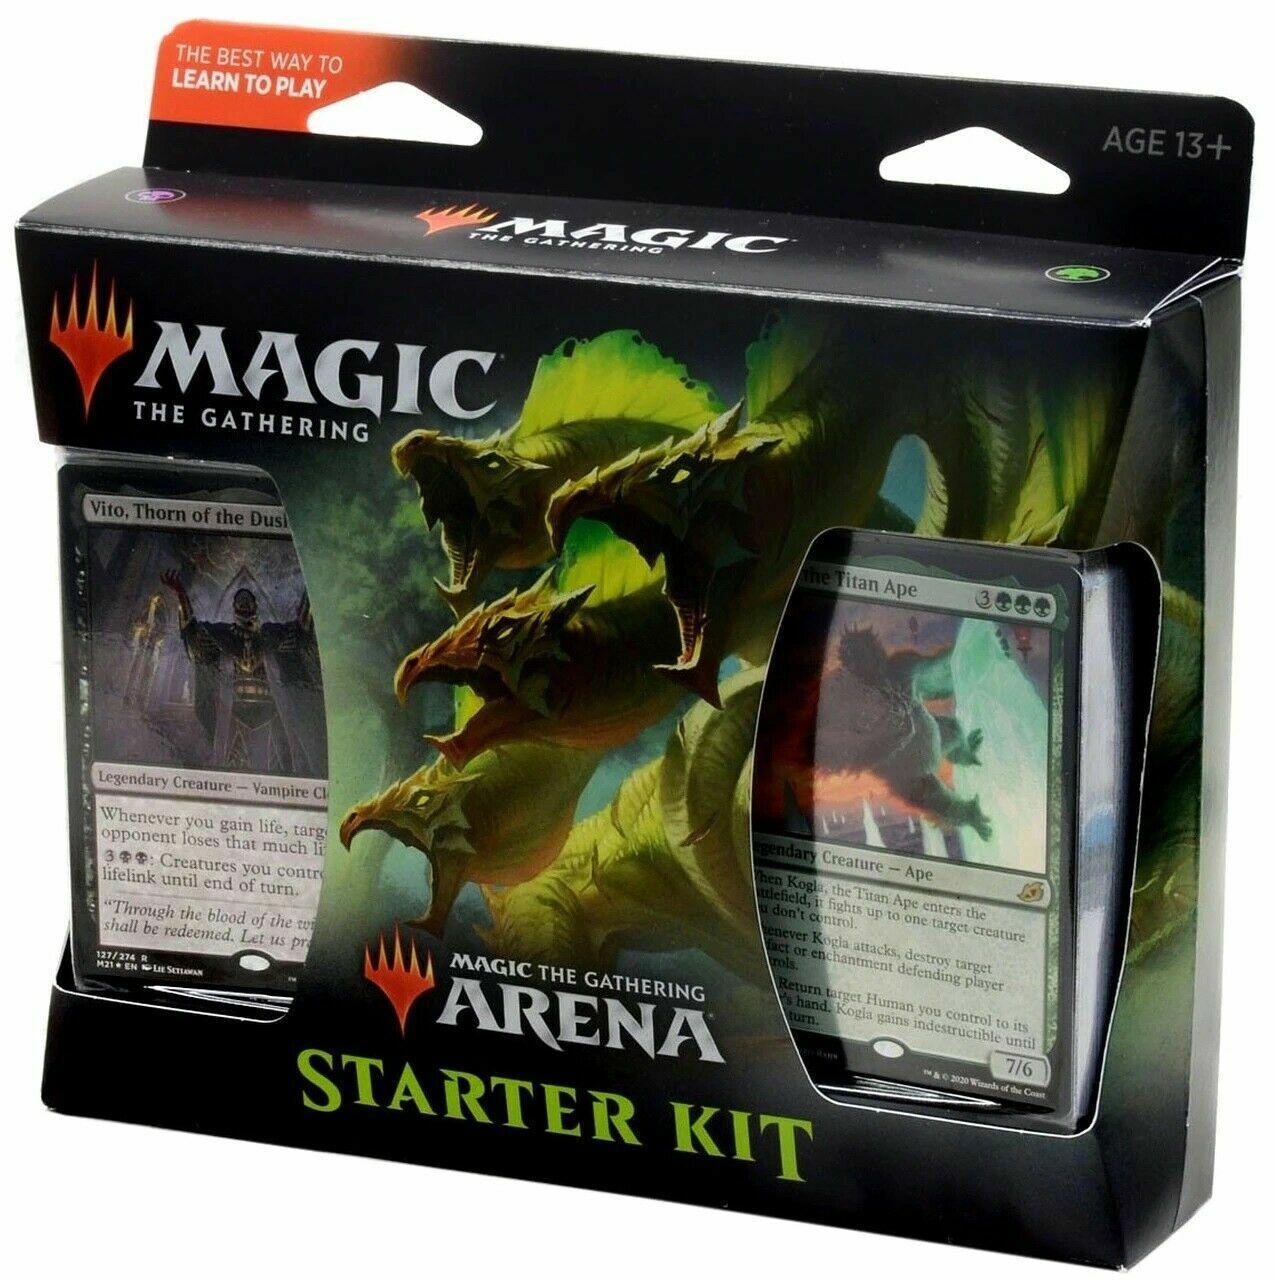 Magic The Gathering Ikoria Lair of Behemoths Commander Decks for sale online